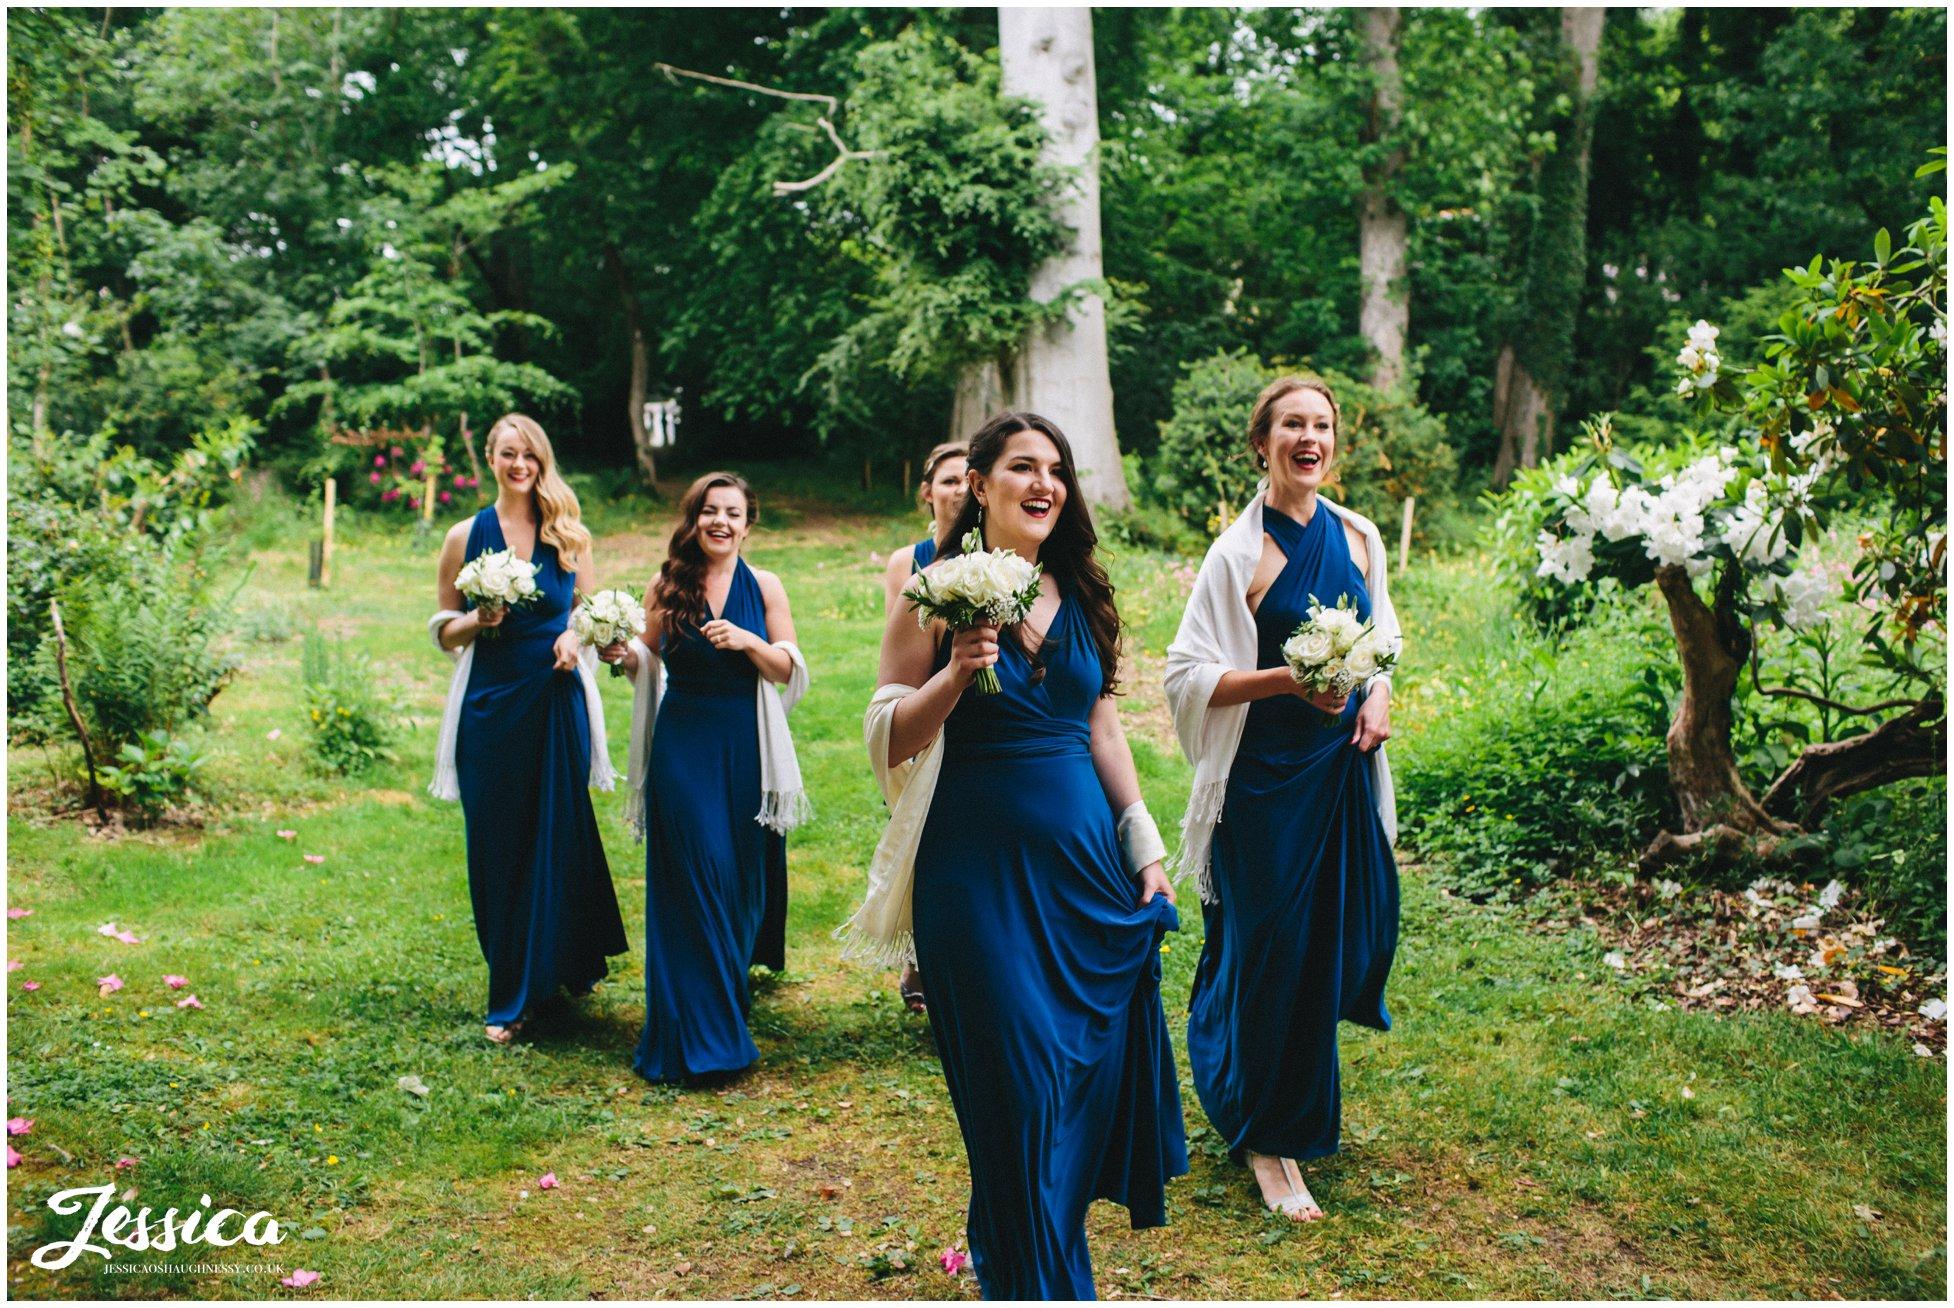 bridesmaids walk down grass path to trevor hall's church